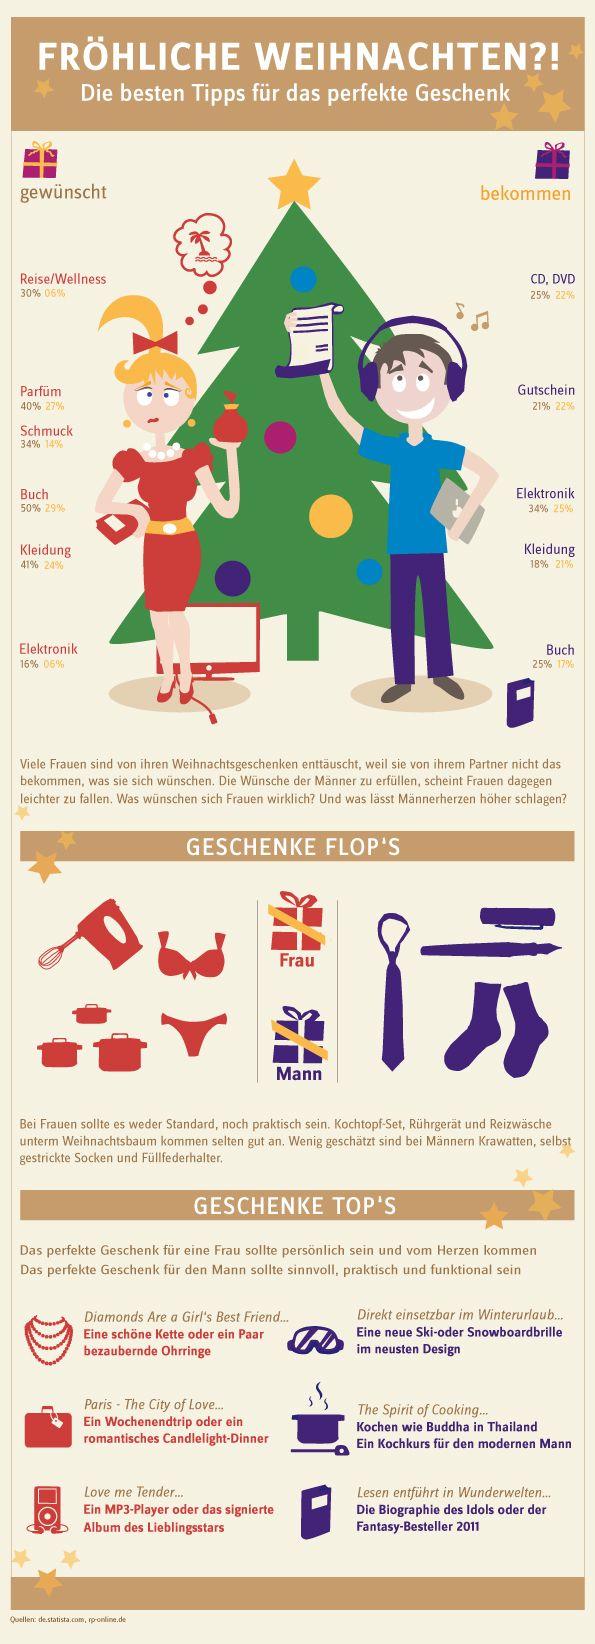 45 best interessante infografiken auf deutsch images on. Black Bedroom Furniture Sets. Home Design Ideas